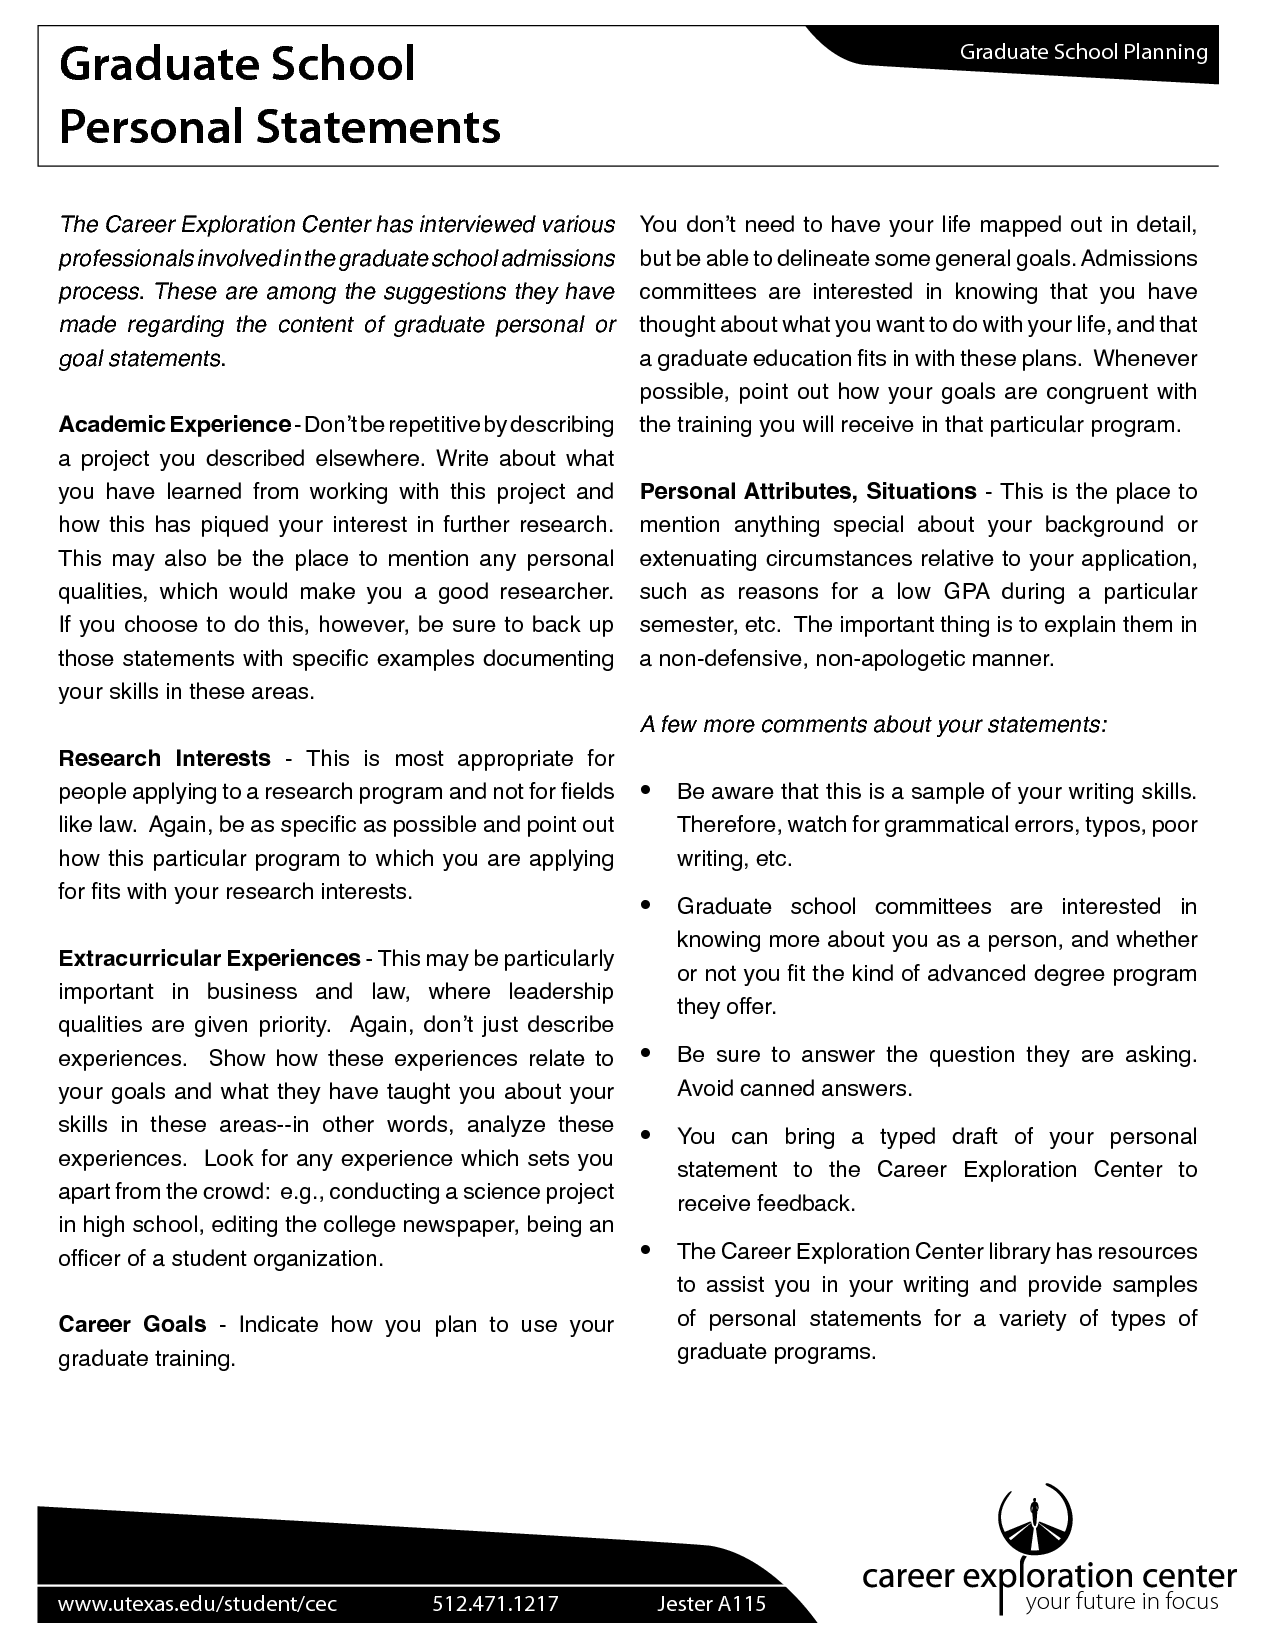 Best Personal Essay Ghostwriter Websites For Masters Best Opinion Personal Statement School Essay Personal Statement Examples